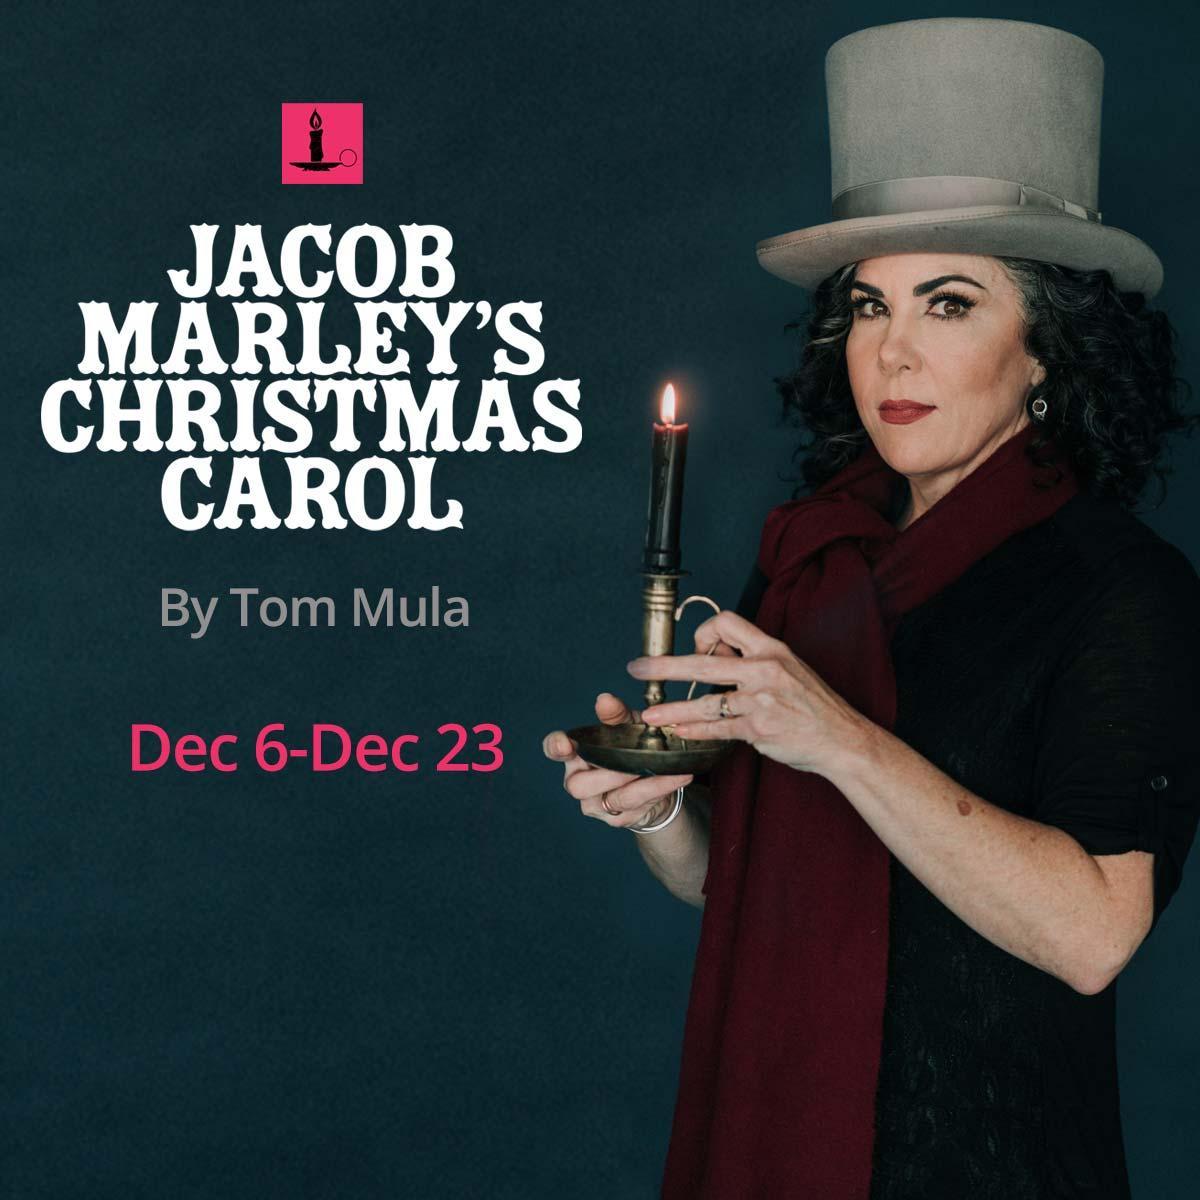 Jacob Marley Christmas Carol.Jacob Marley S Christmas Carol Stage West Theatre Ft